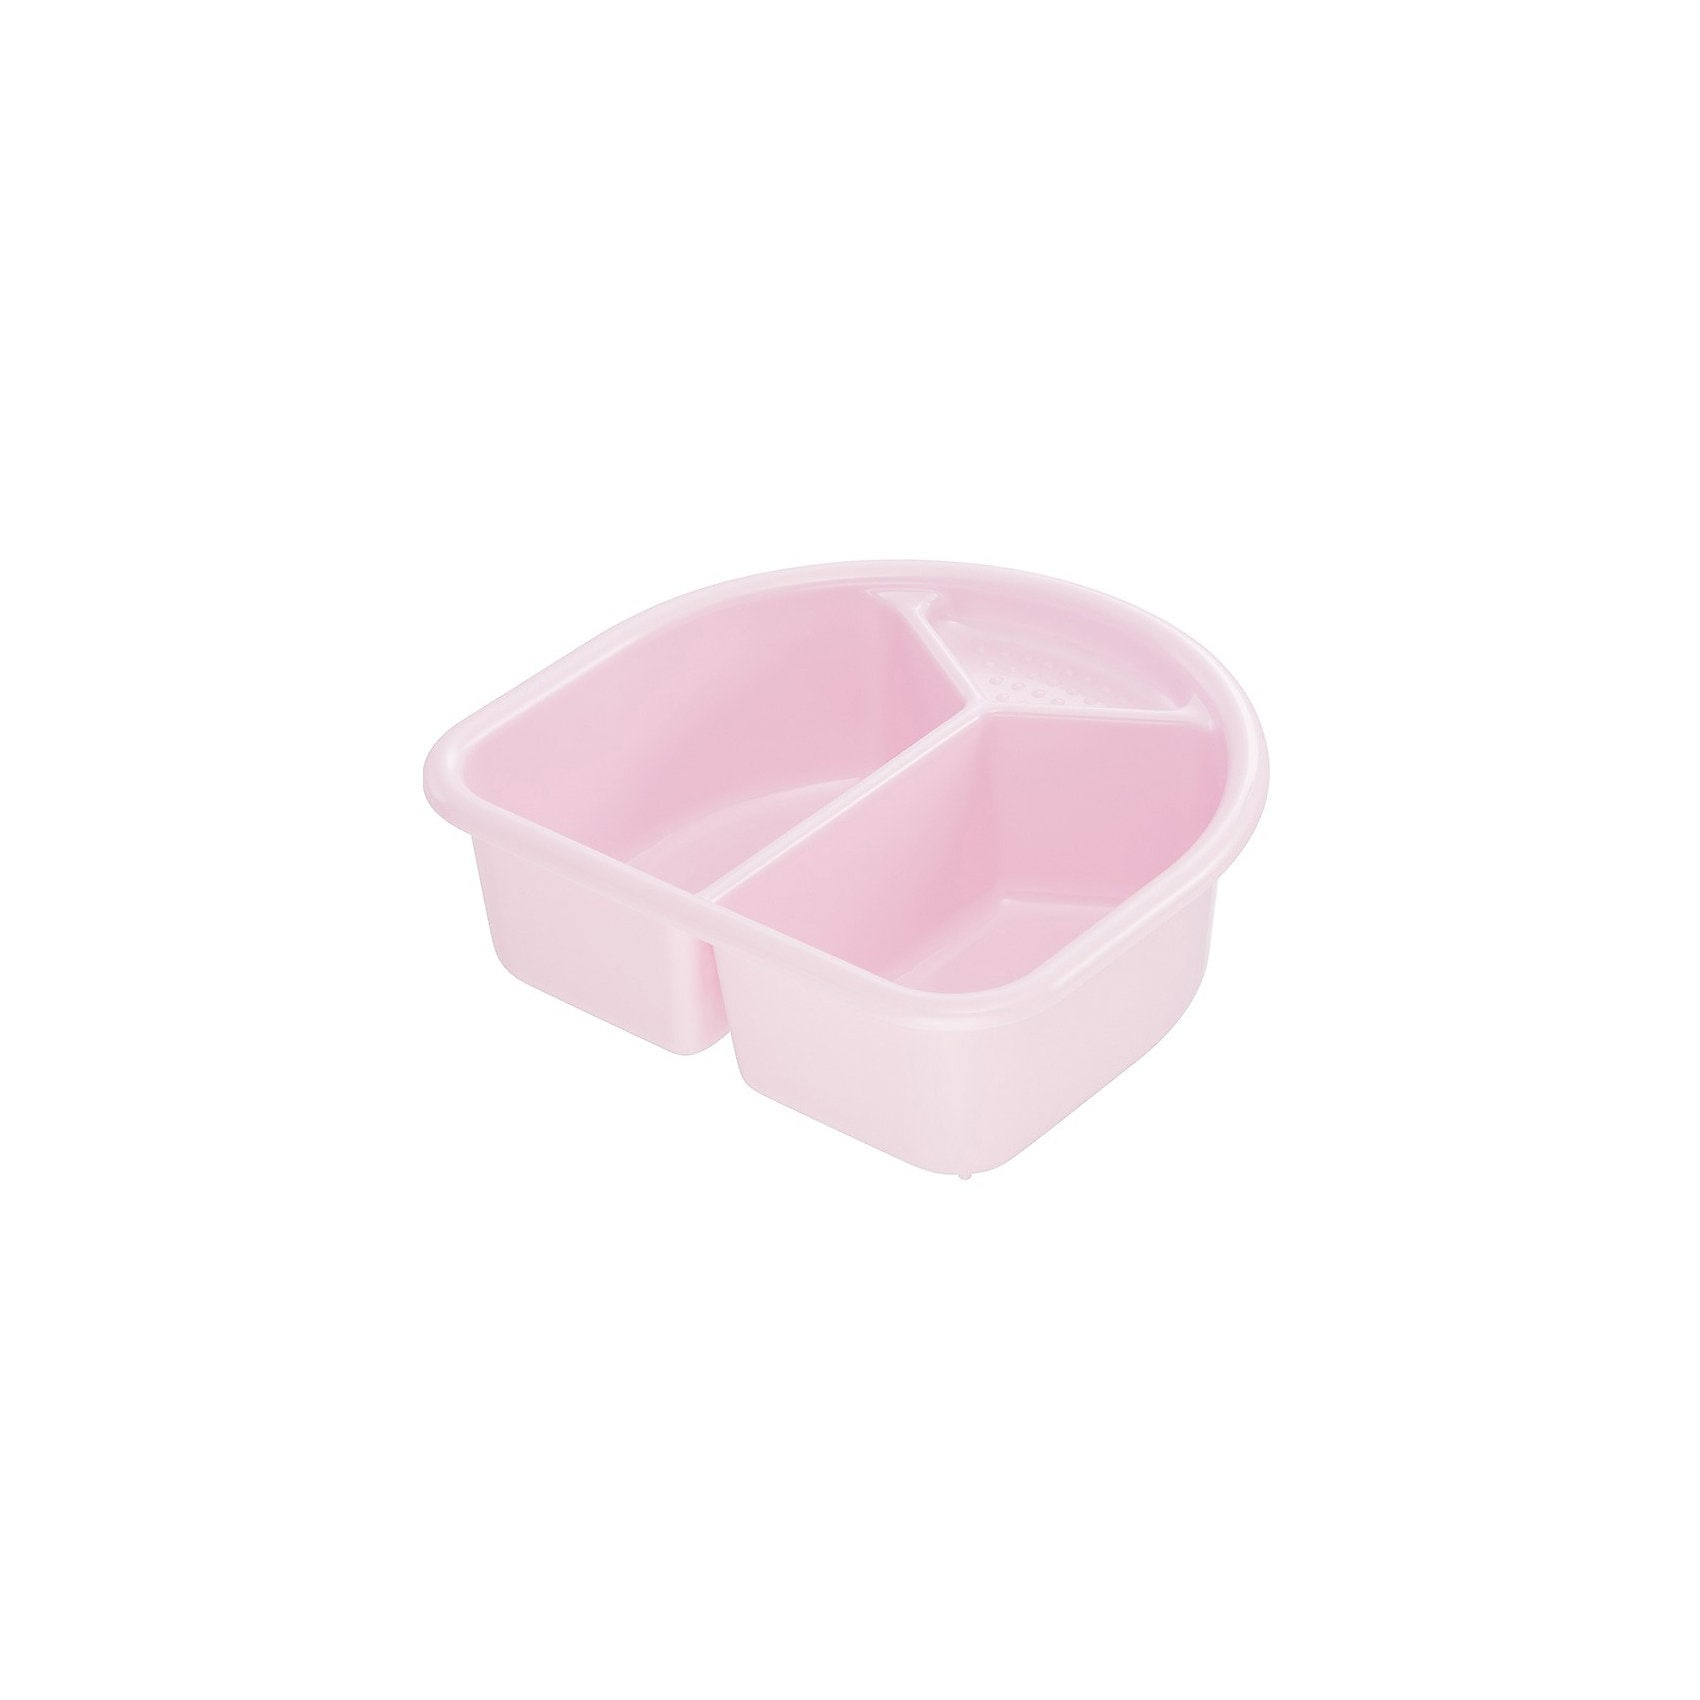 Rotho Babydesign Waschschüssel Top tender rose perl